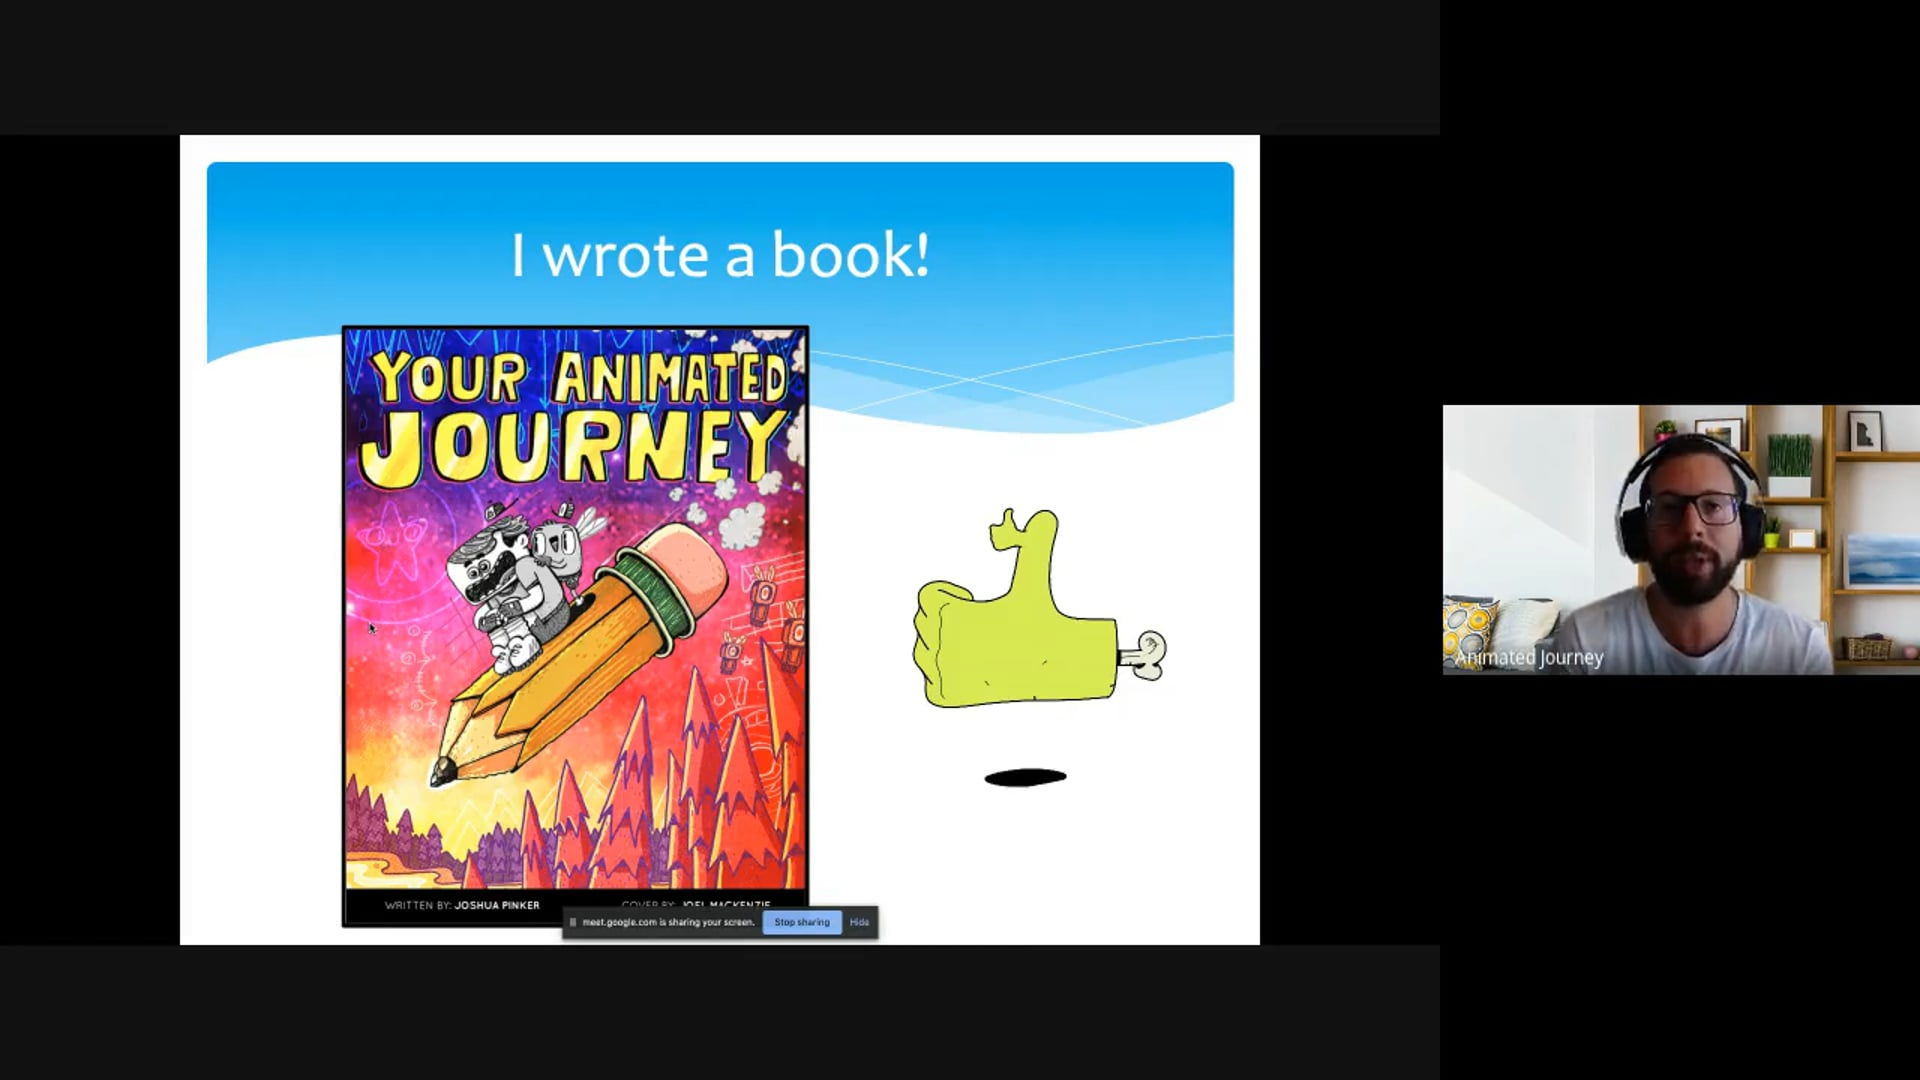 @SislerCREATE talk on @YAJofficialbook - Your Animated Journey'